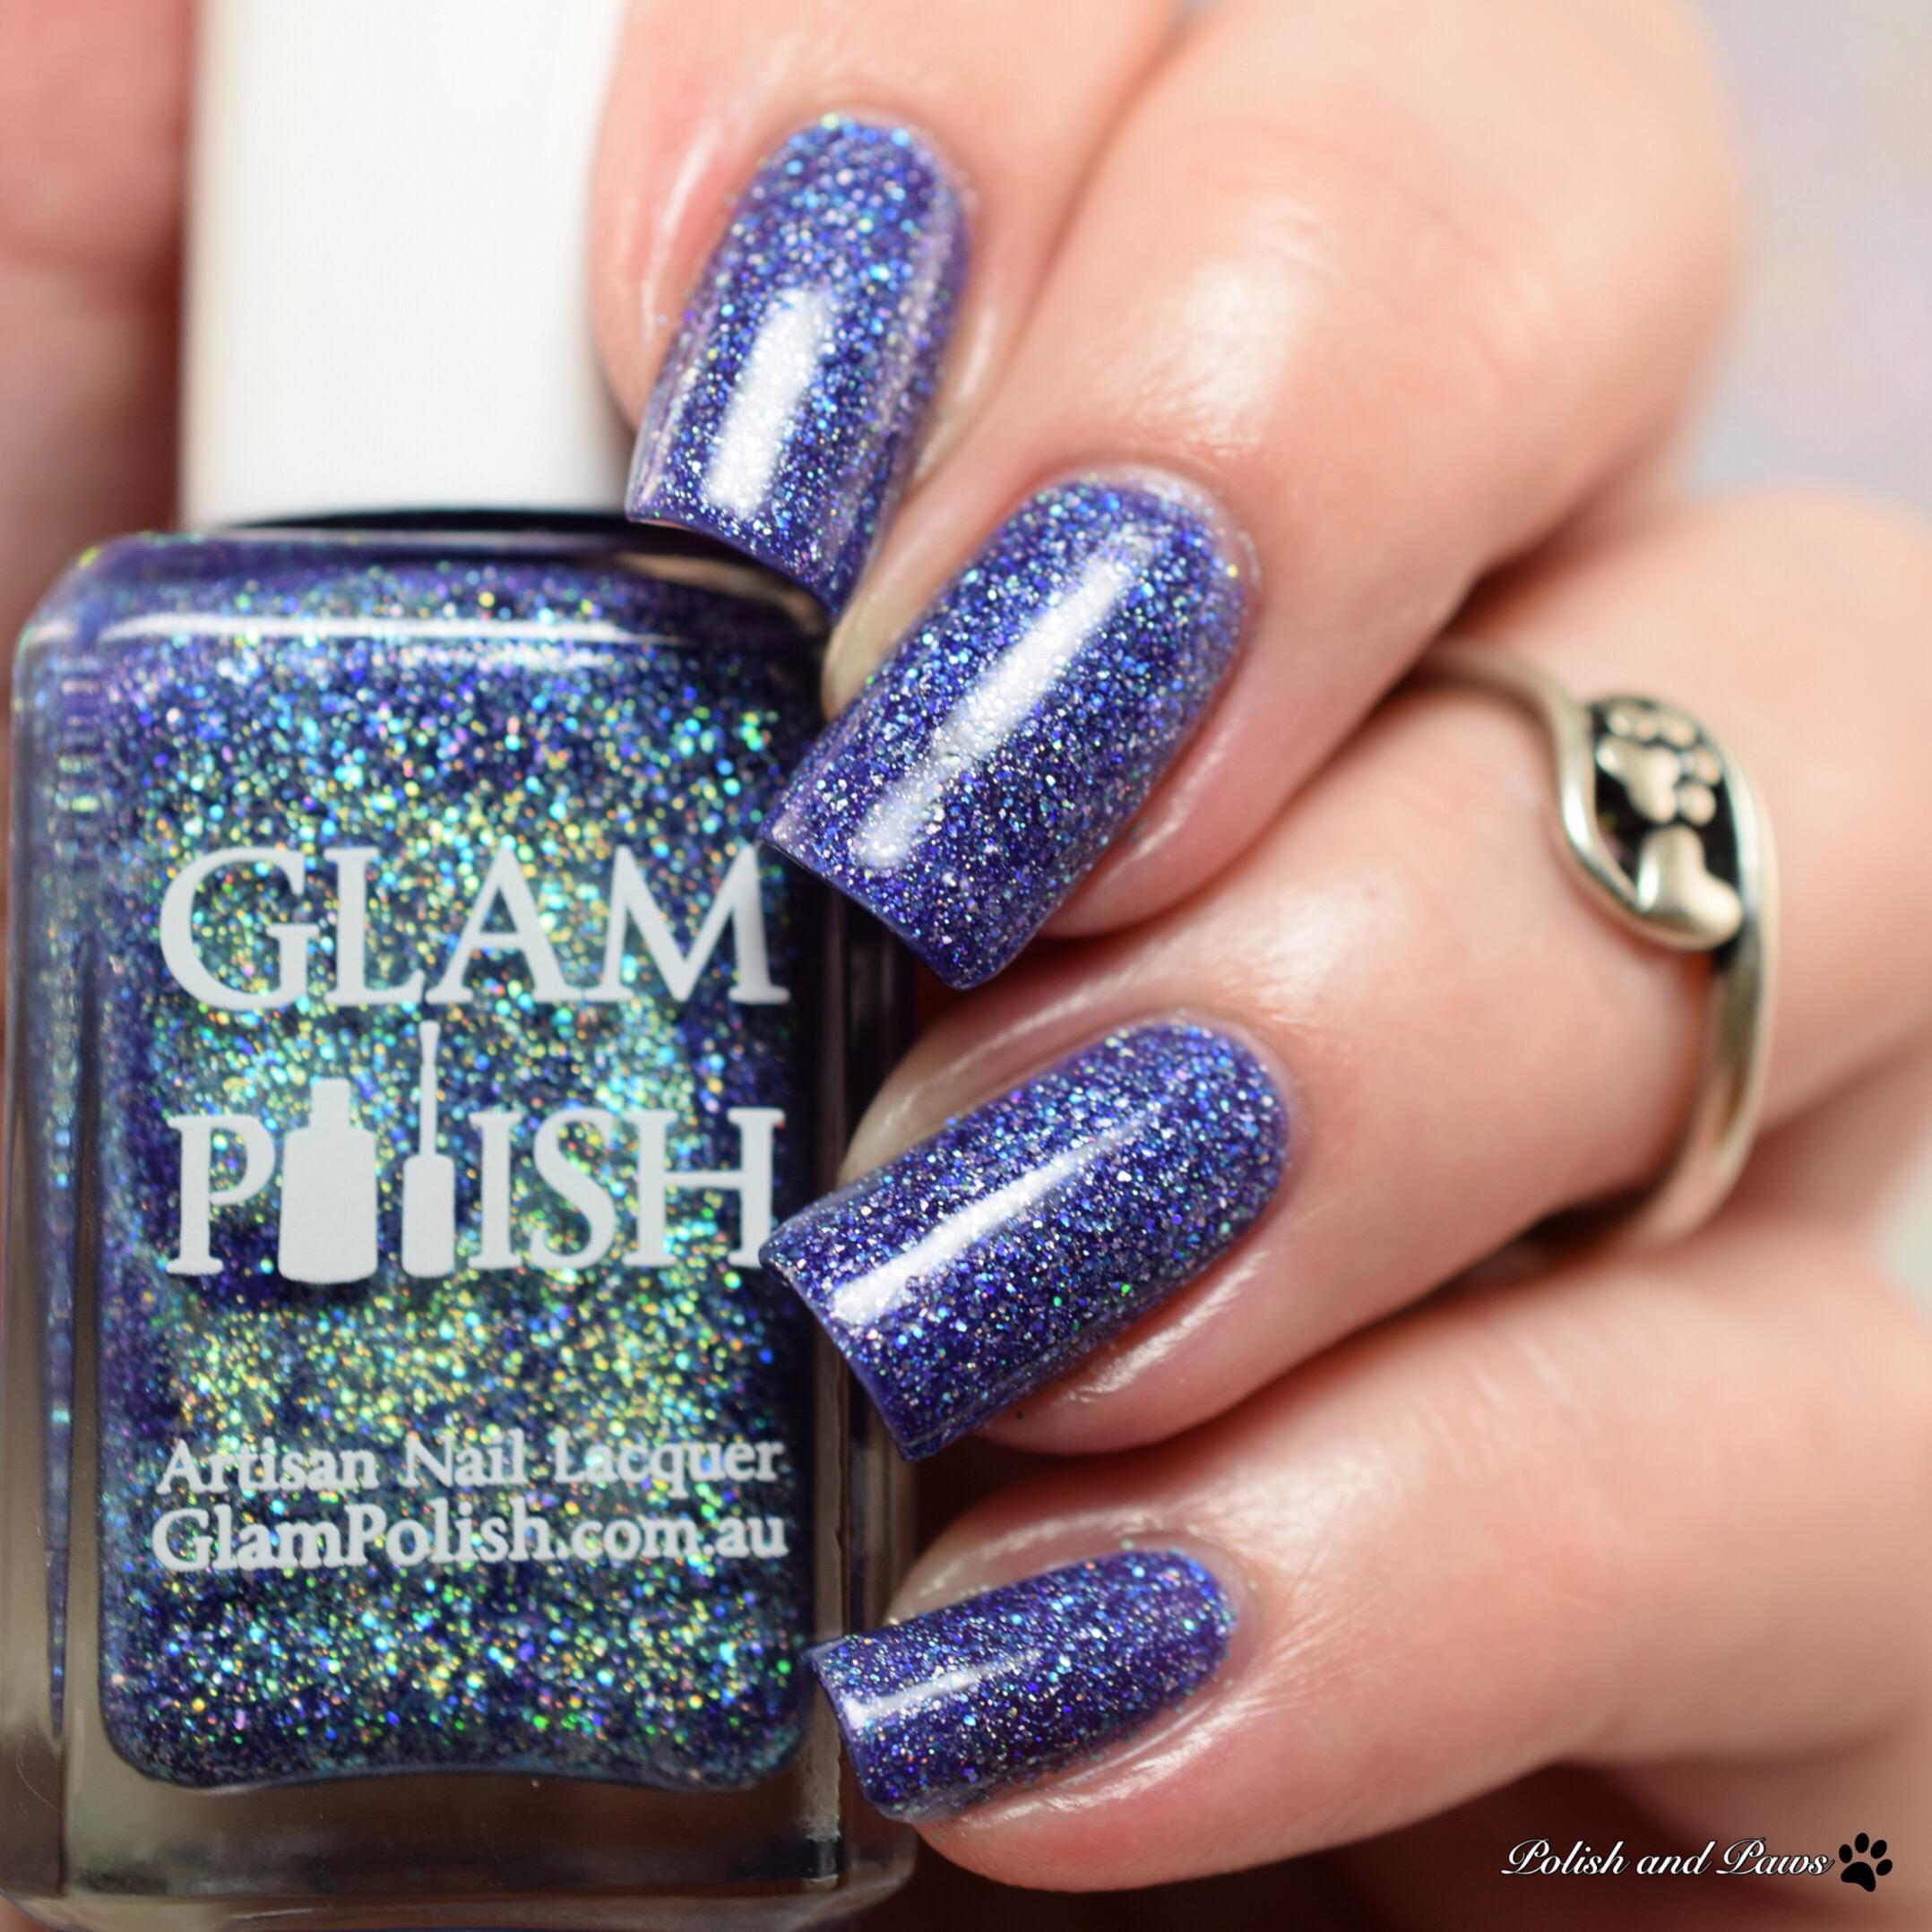 Glam Polish You're Cruisin' for a Bruisin'